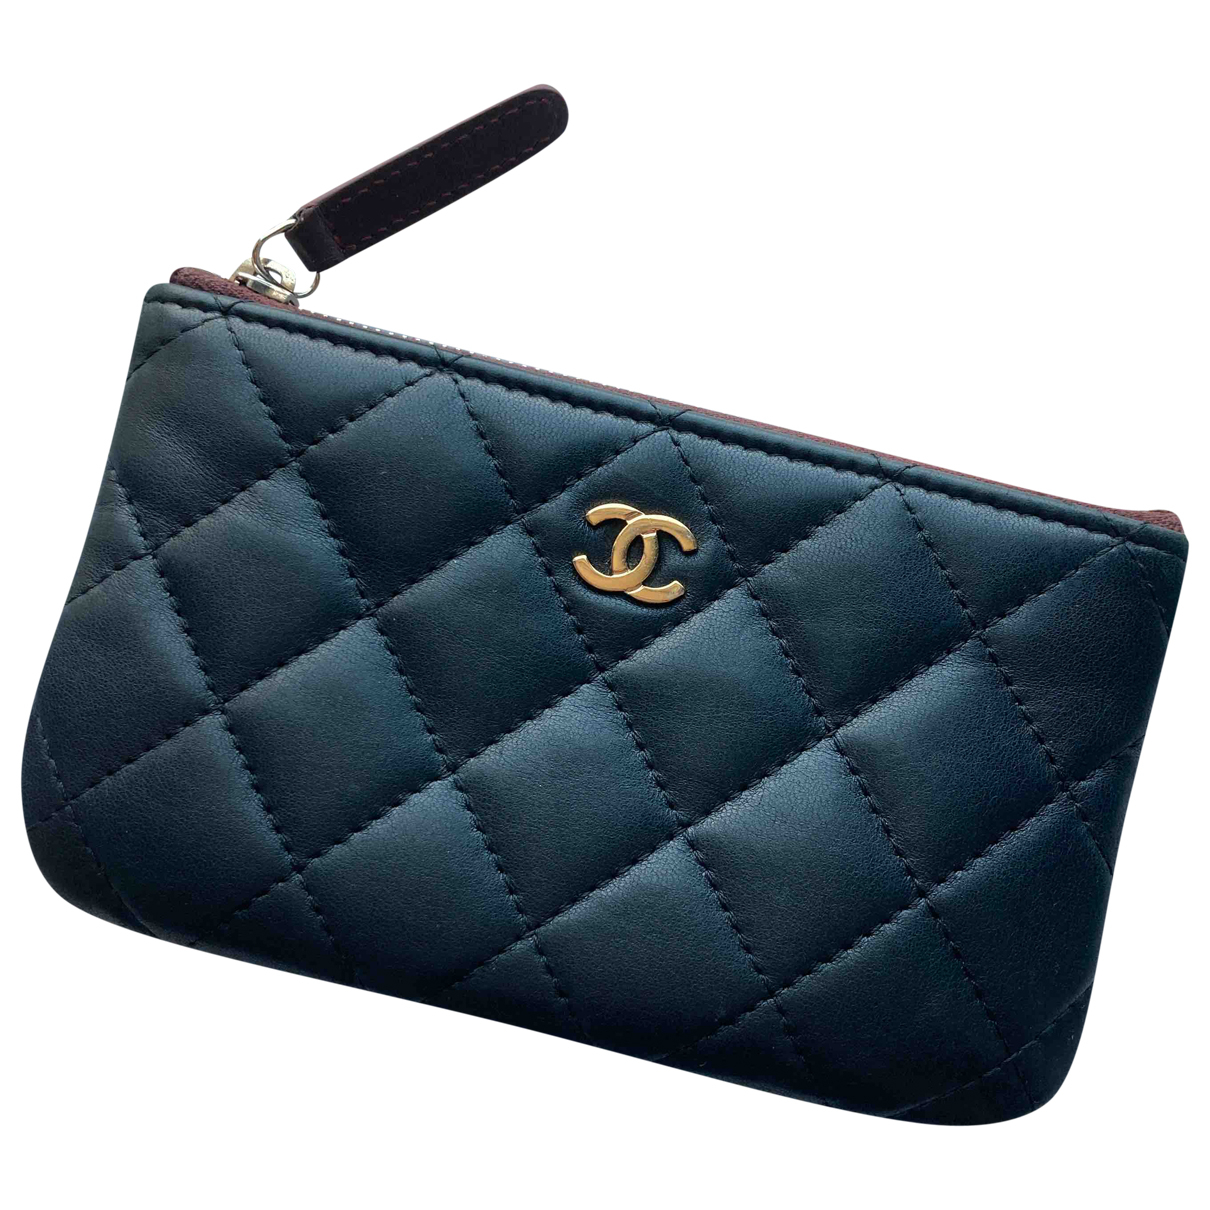 Monedero Timeless/Classique de Cuero Chanel